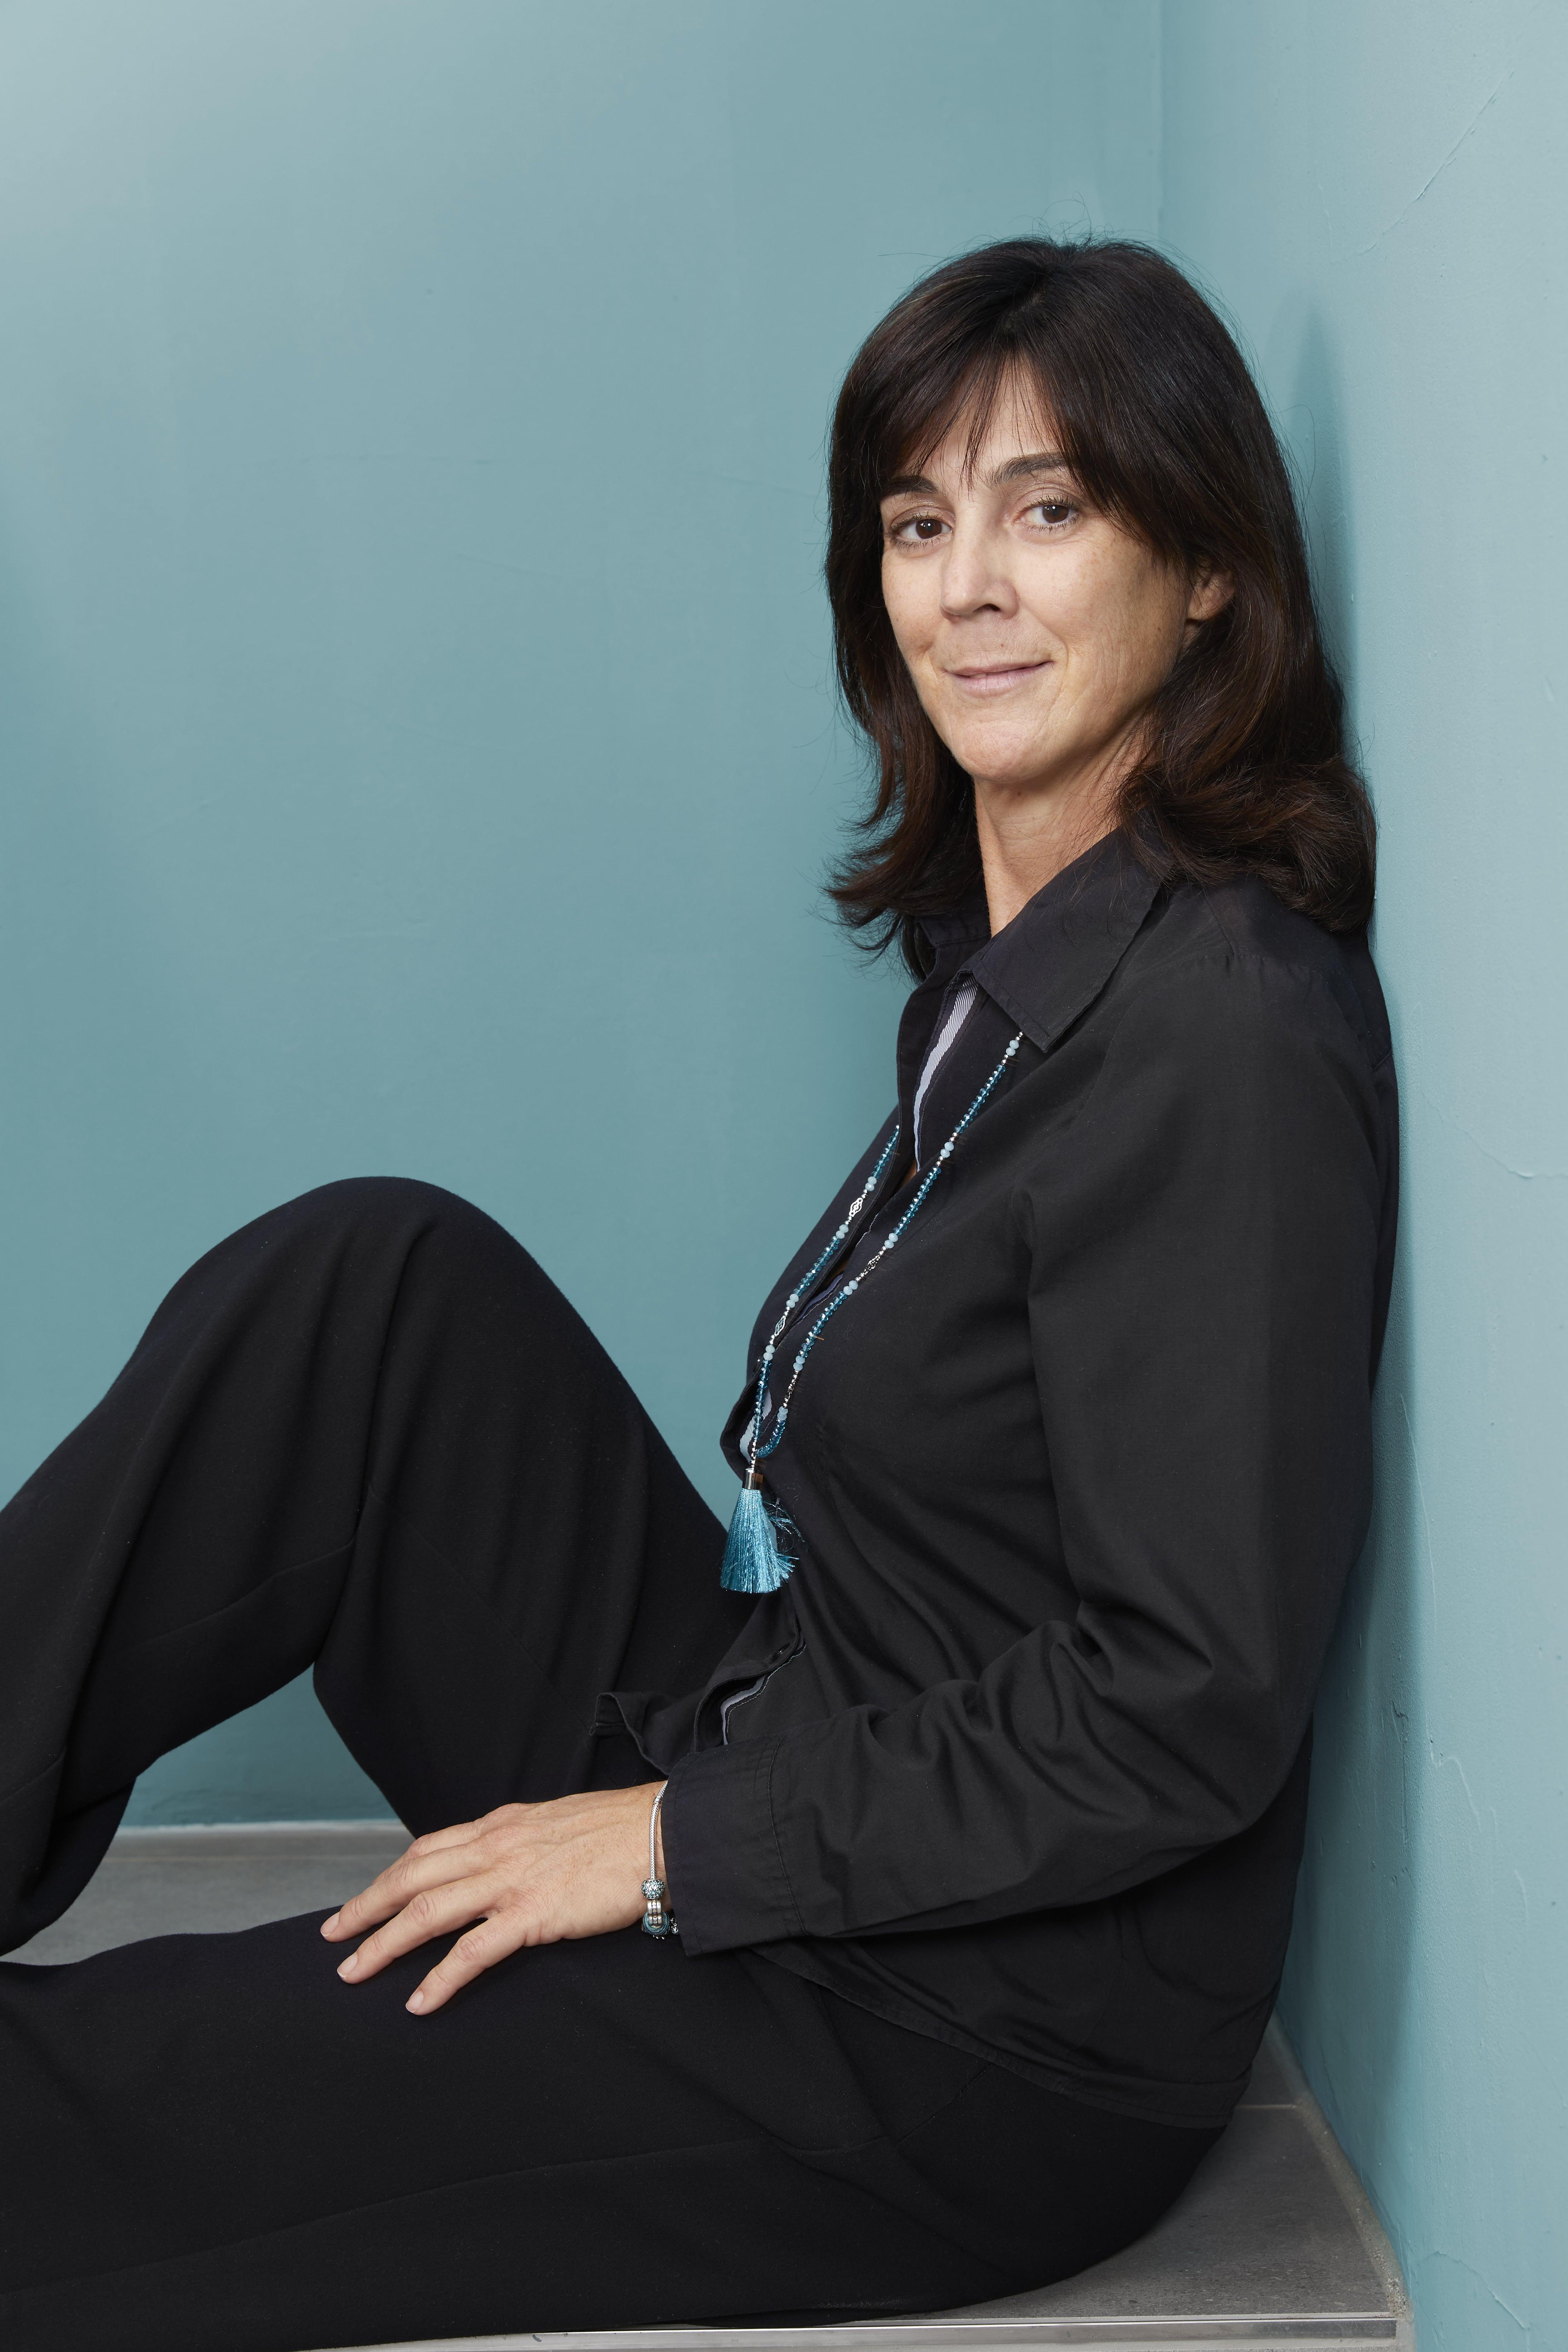 Carole Plaschy